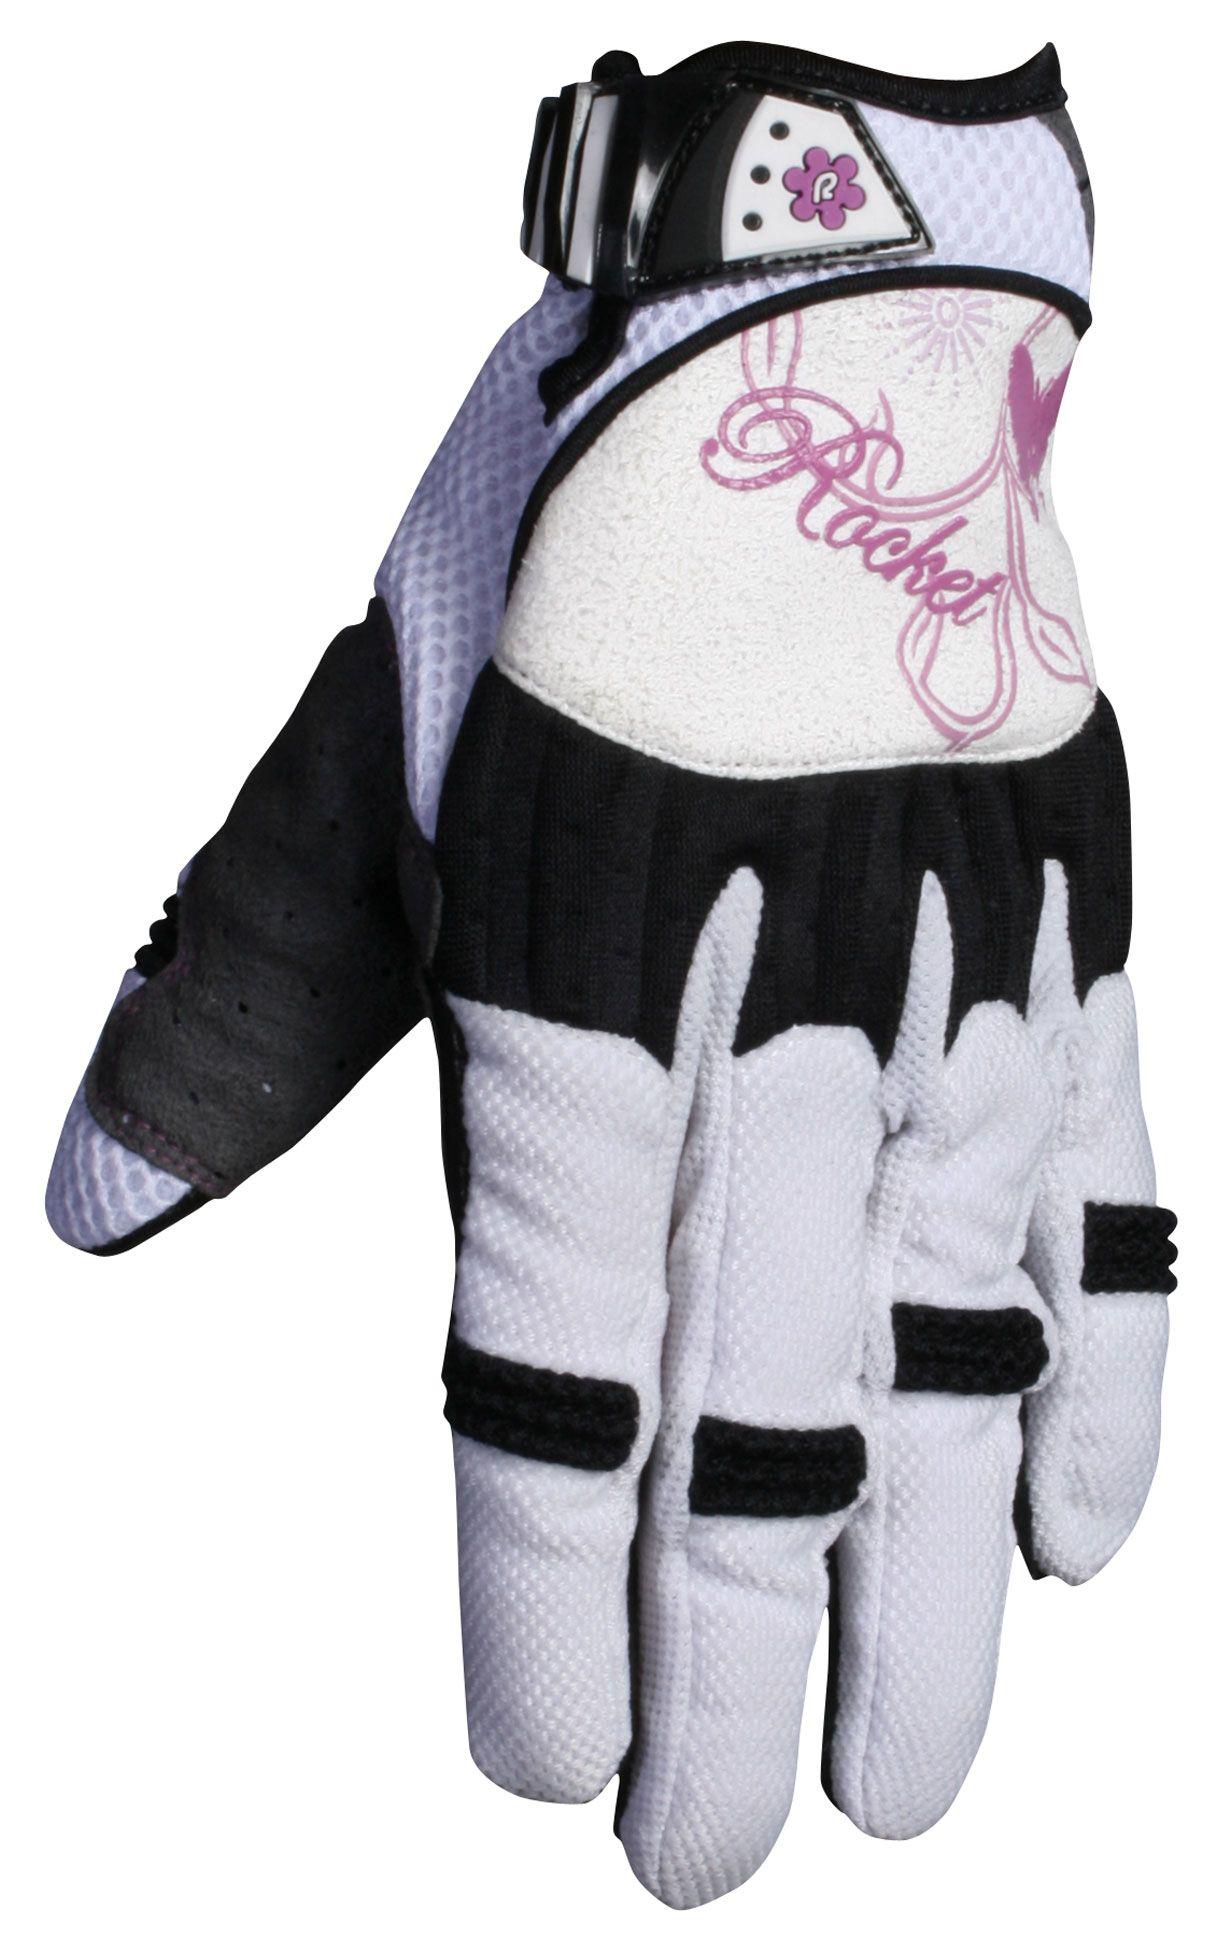 Joe rocket leather motorcycle gloves - Joe Rocket Leather Motorcycle Gloves 28